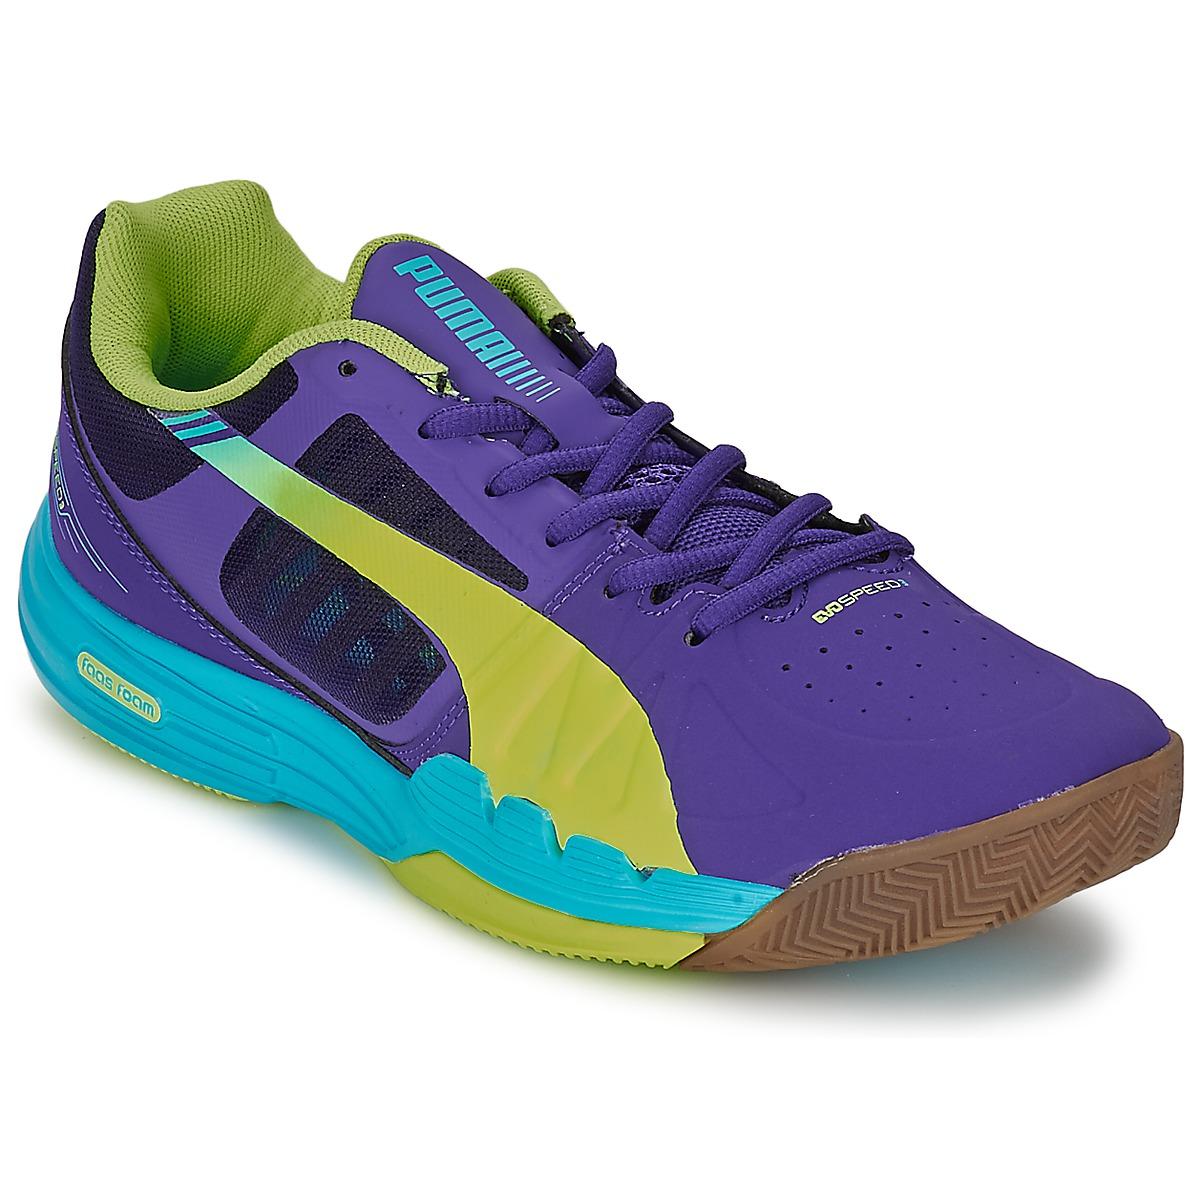 Chaussures-de-sport Puma EVOSPEED INDOOR 3.3 Violet / Jaune / Bleu